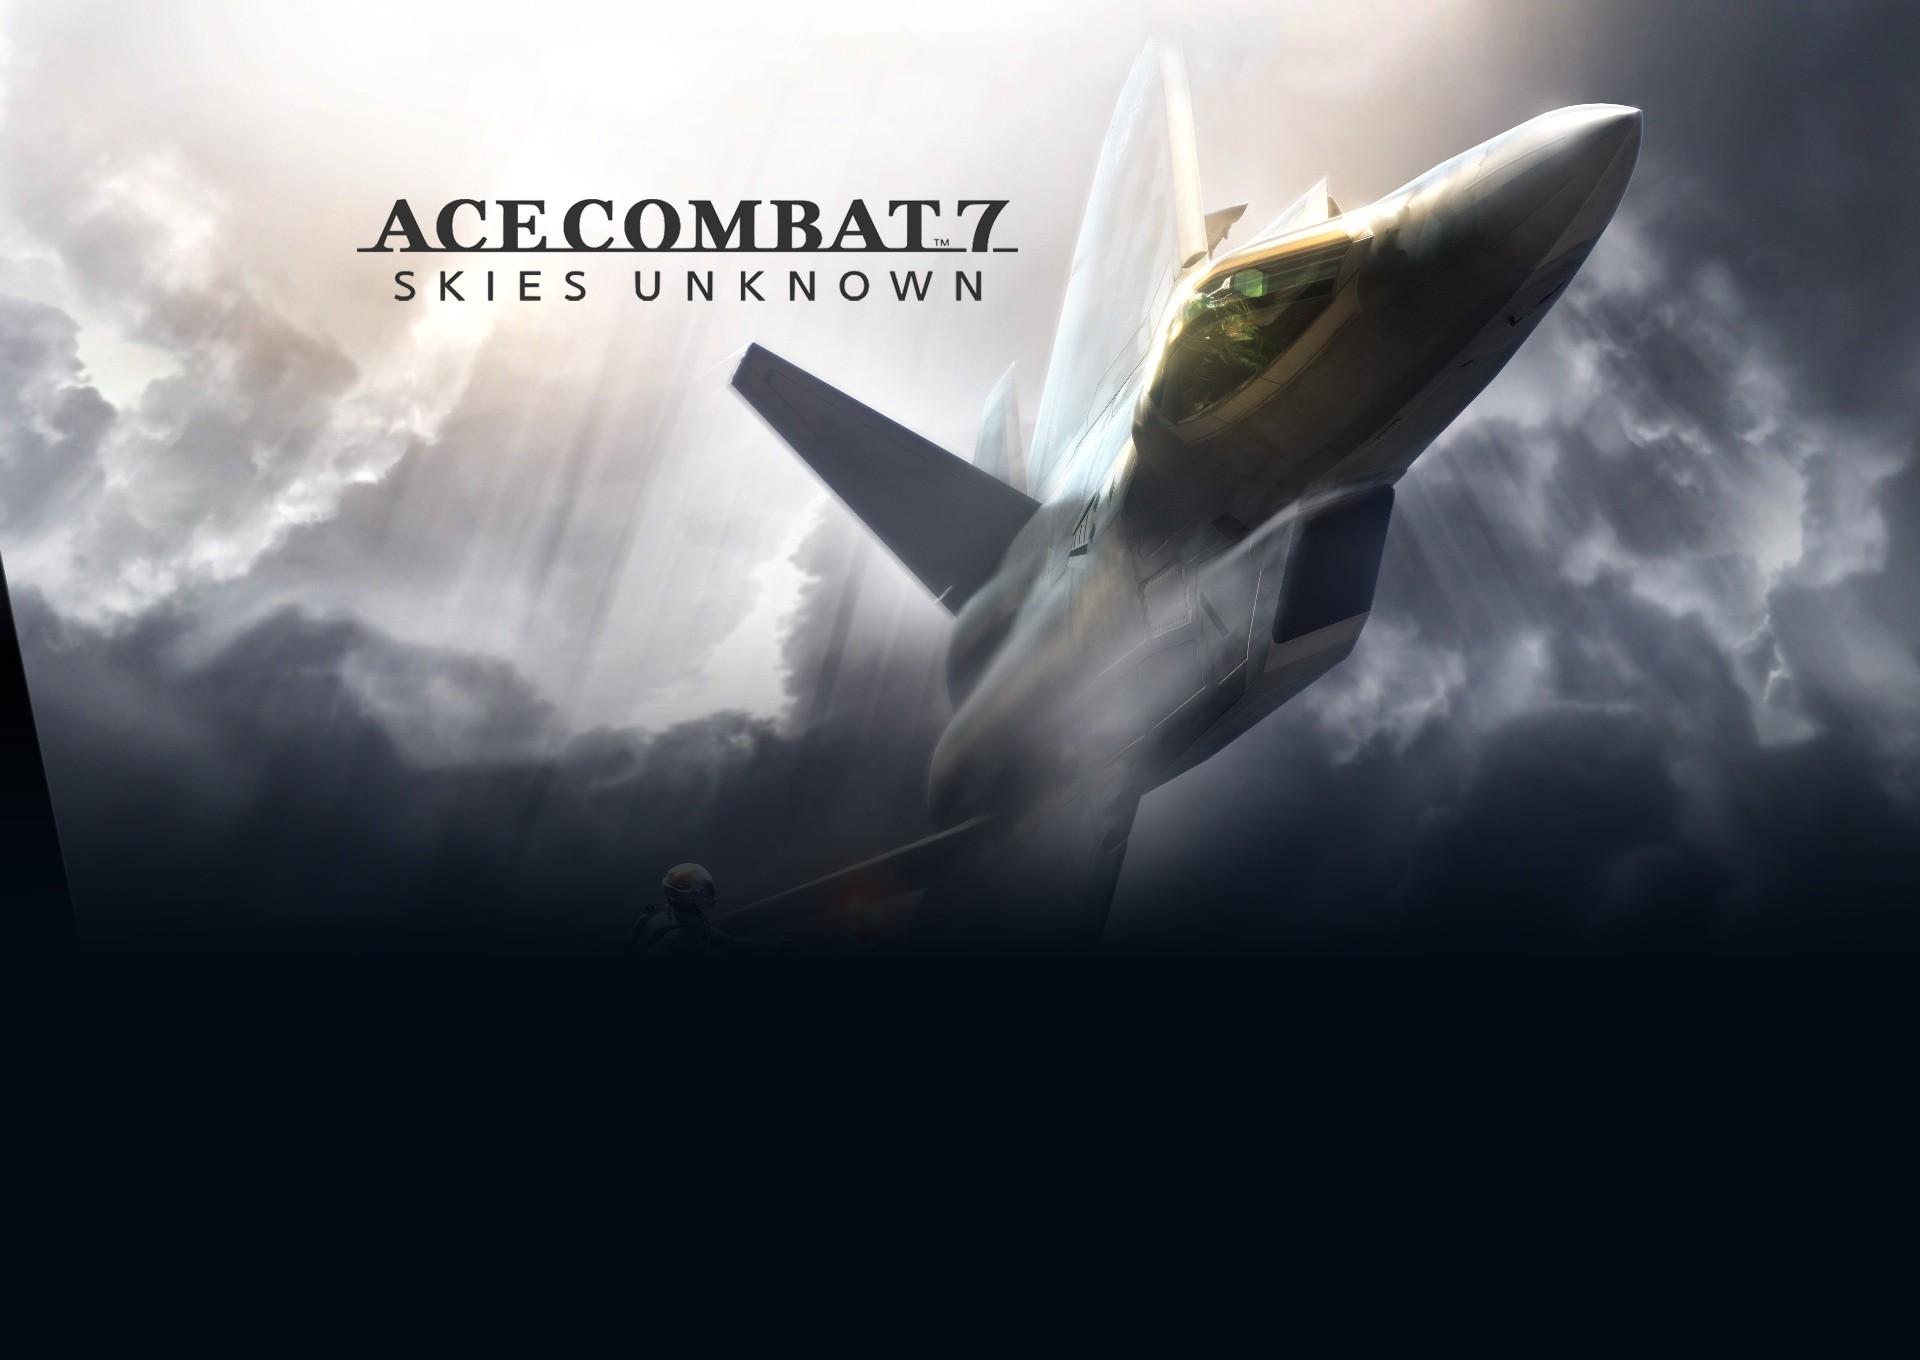 Ace_combat_7